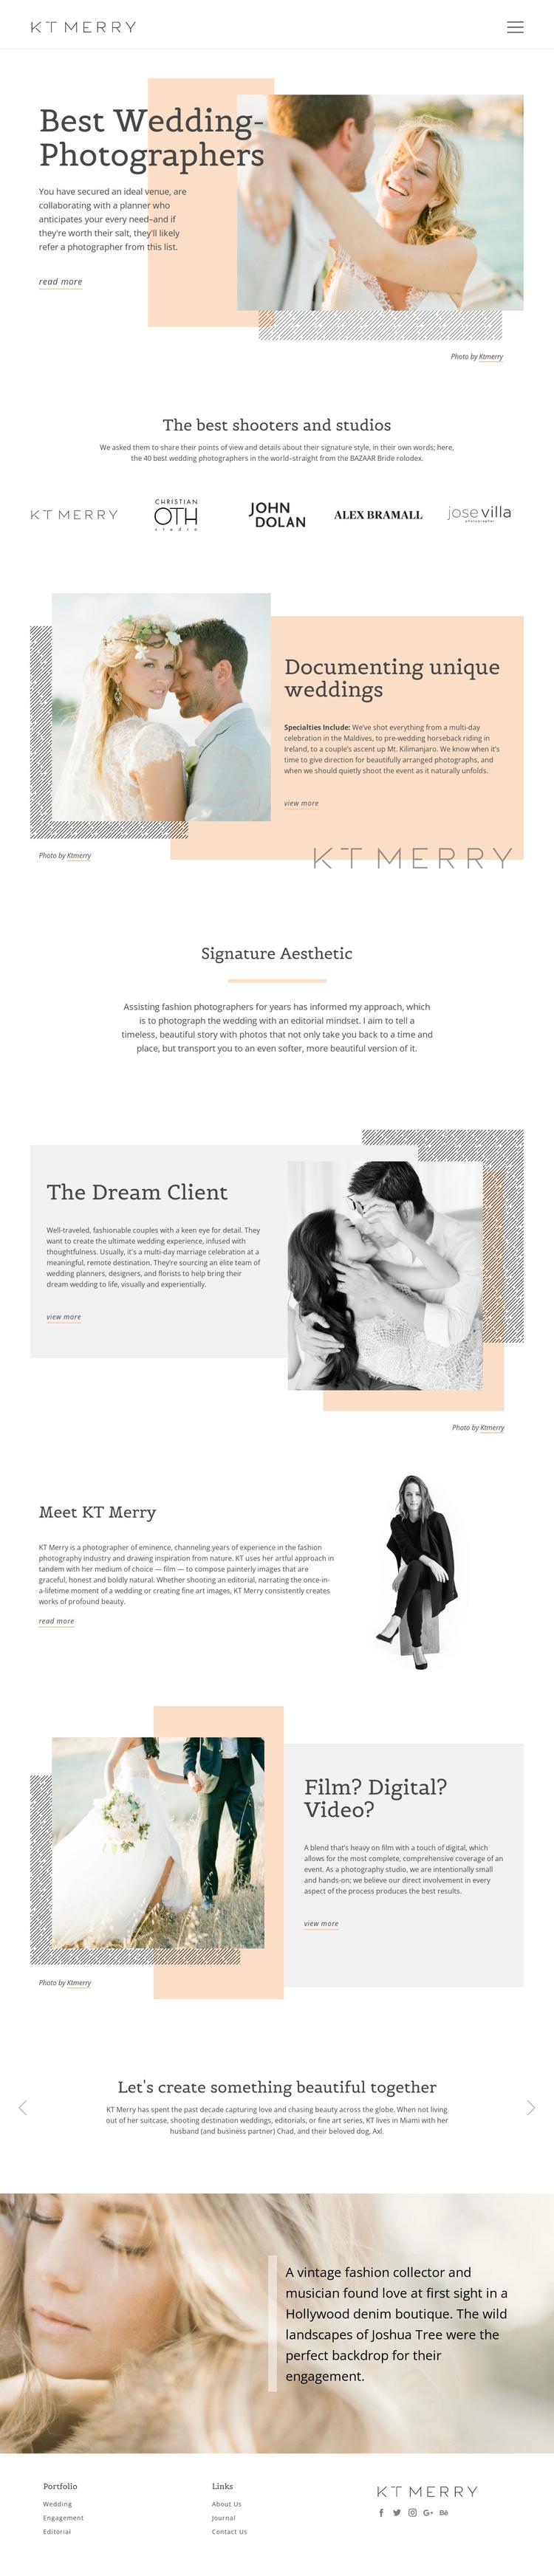 Wedding Photographers Web Design